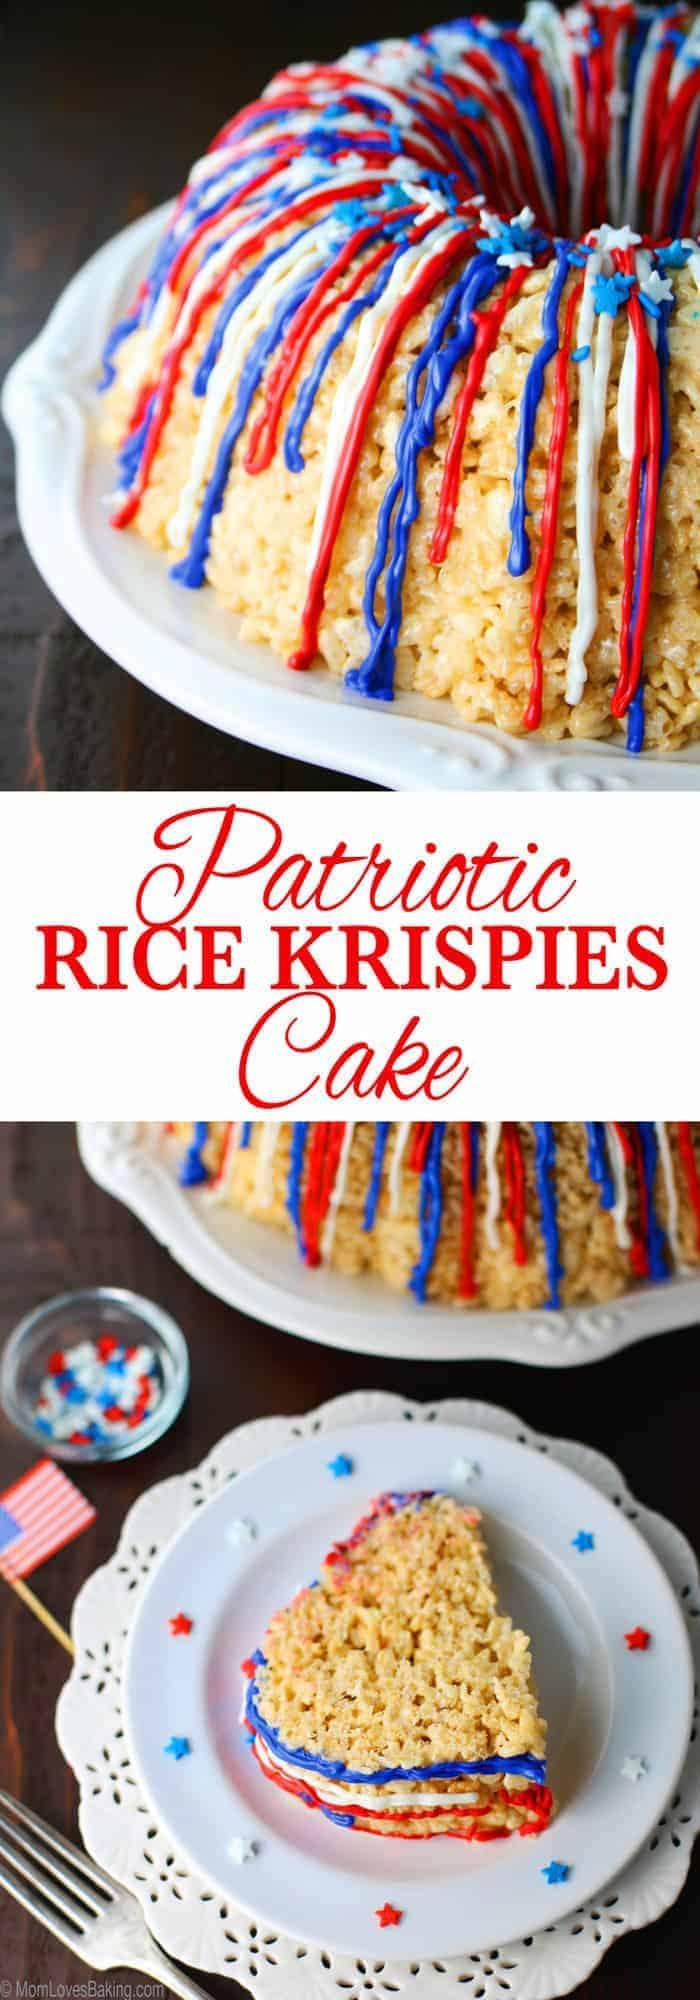 Patriotic Rice Krispies Cake